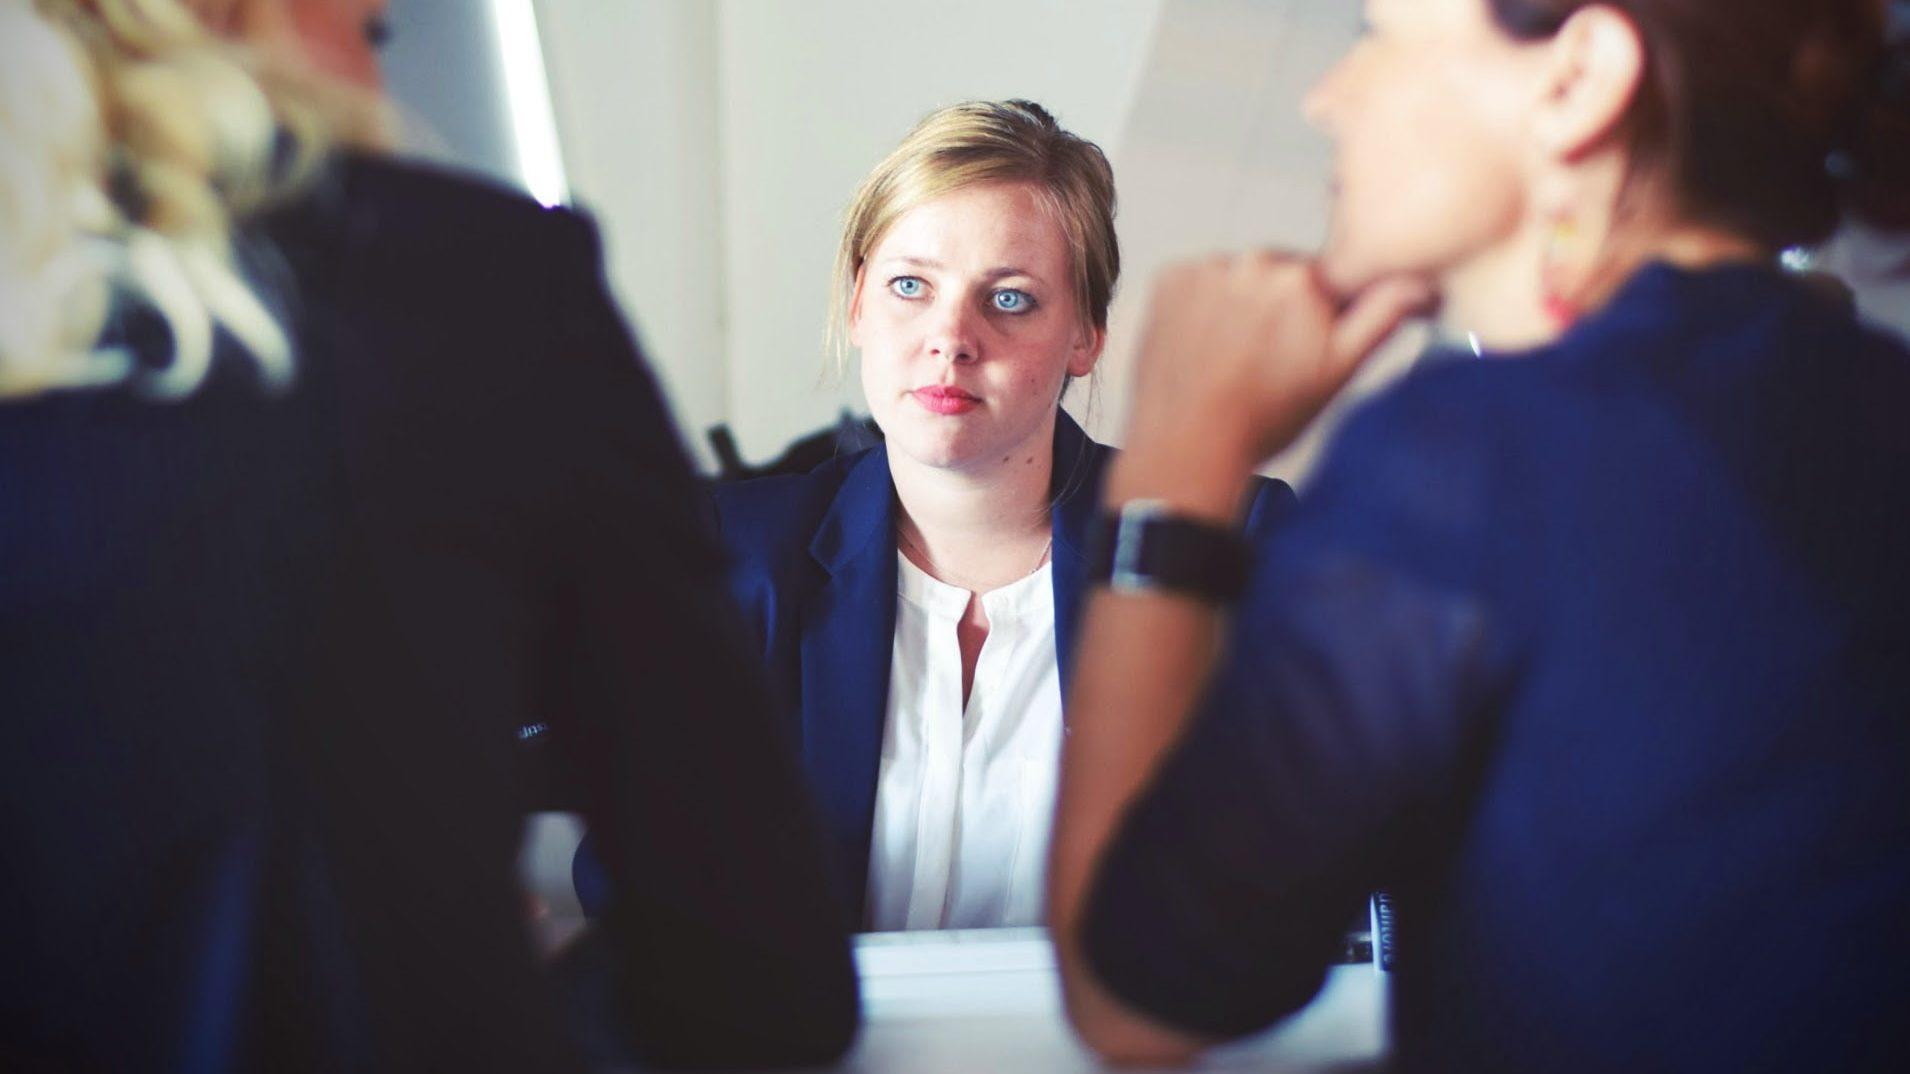 Skills Are HR's Biggest Post-COVID Priority